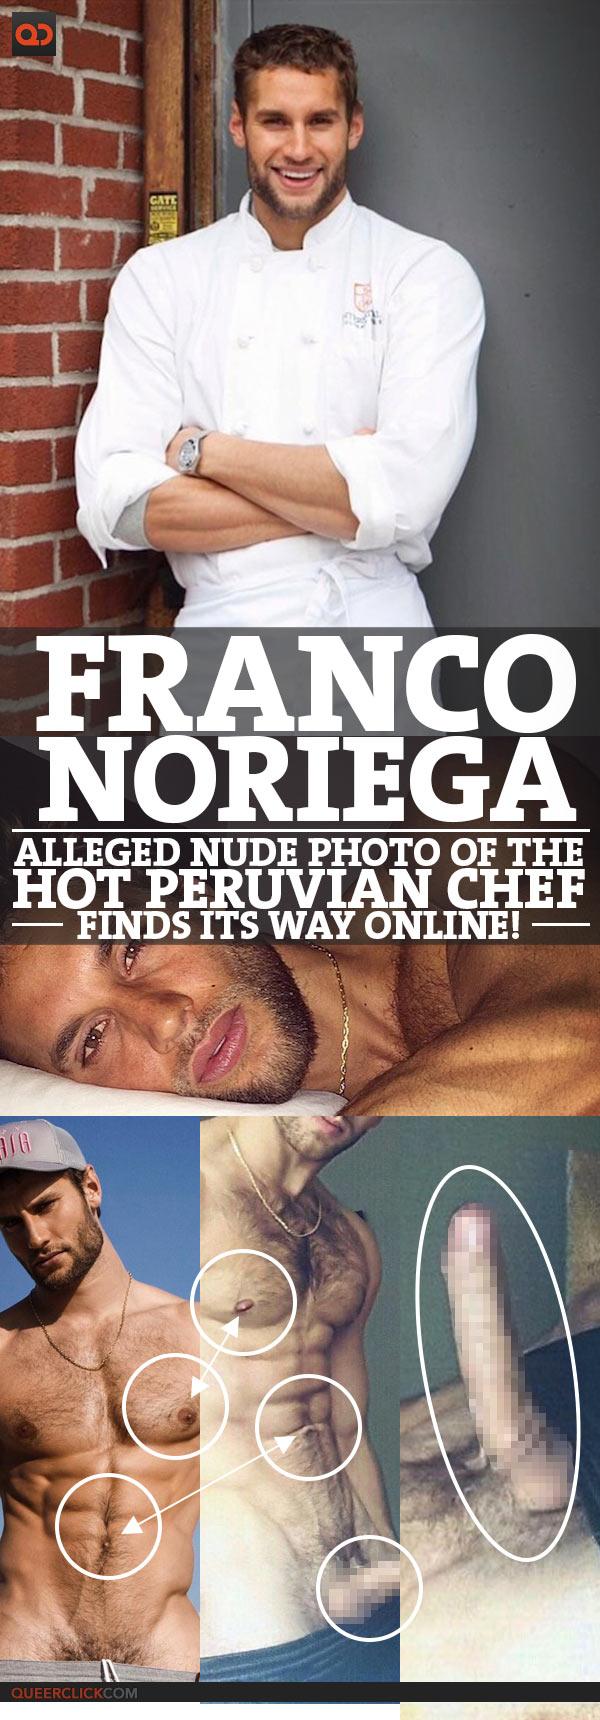 Peruvian gay sex